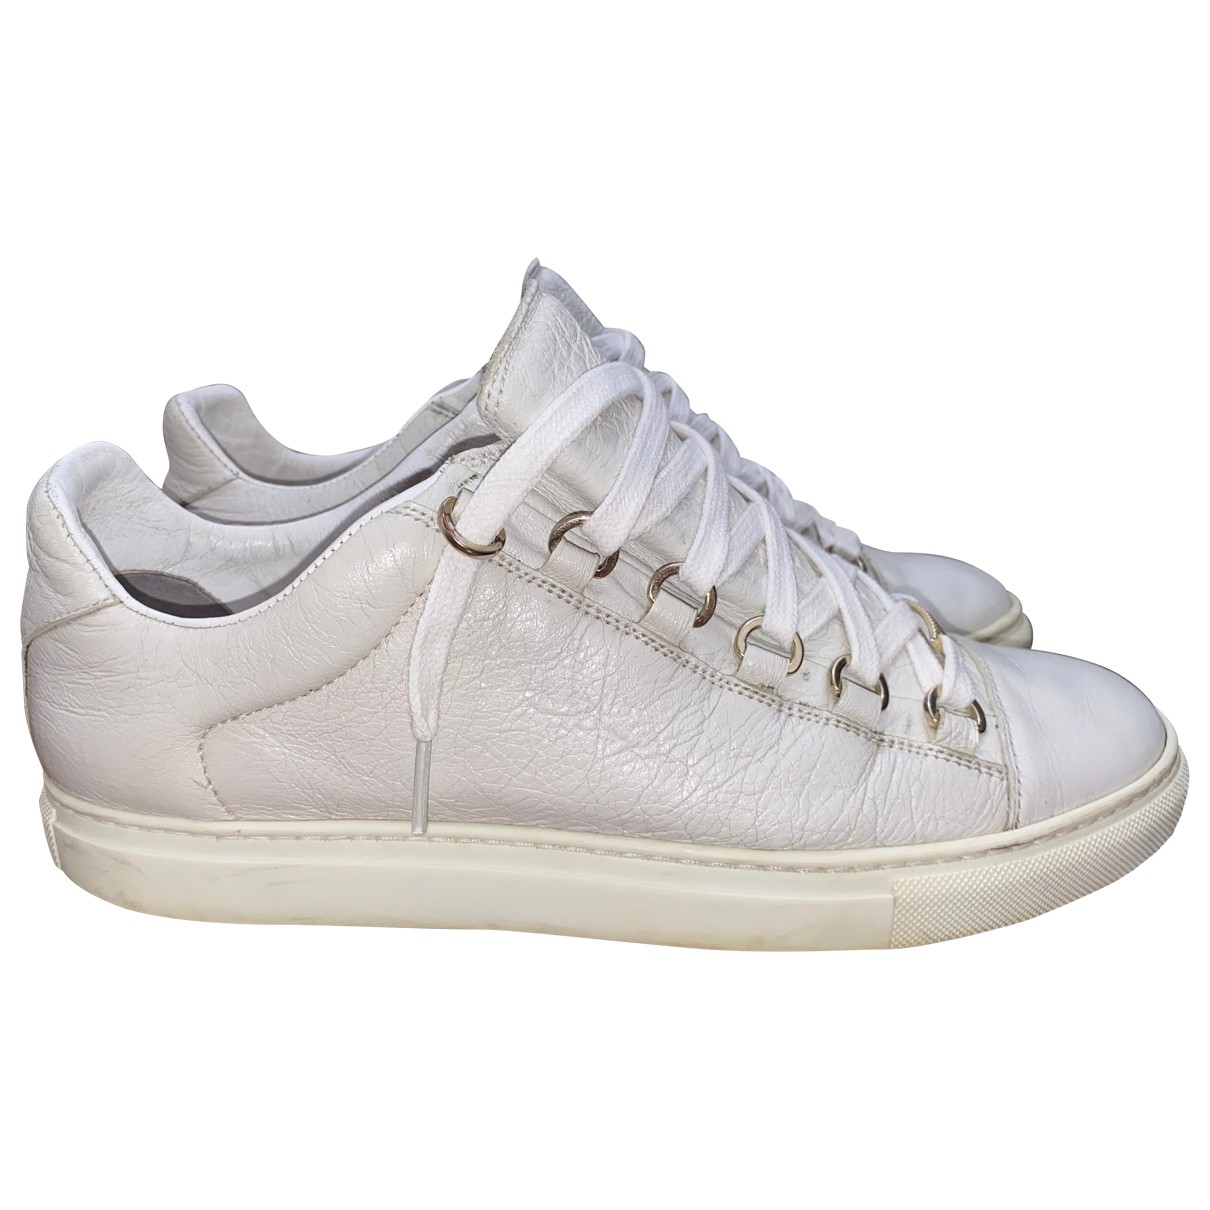 Balenciaga Arena White Leather Trainers for Women 40 EU